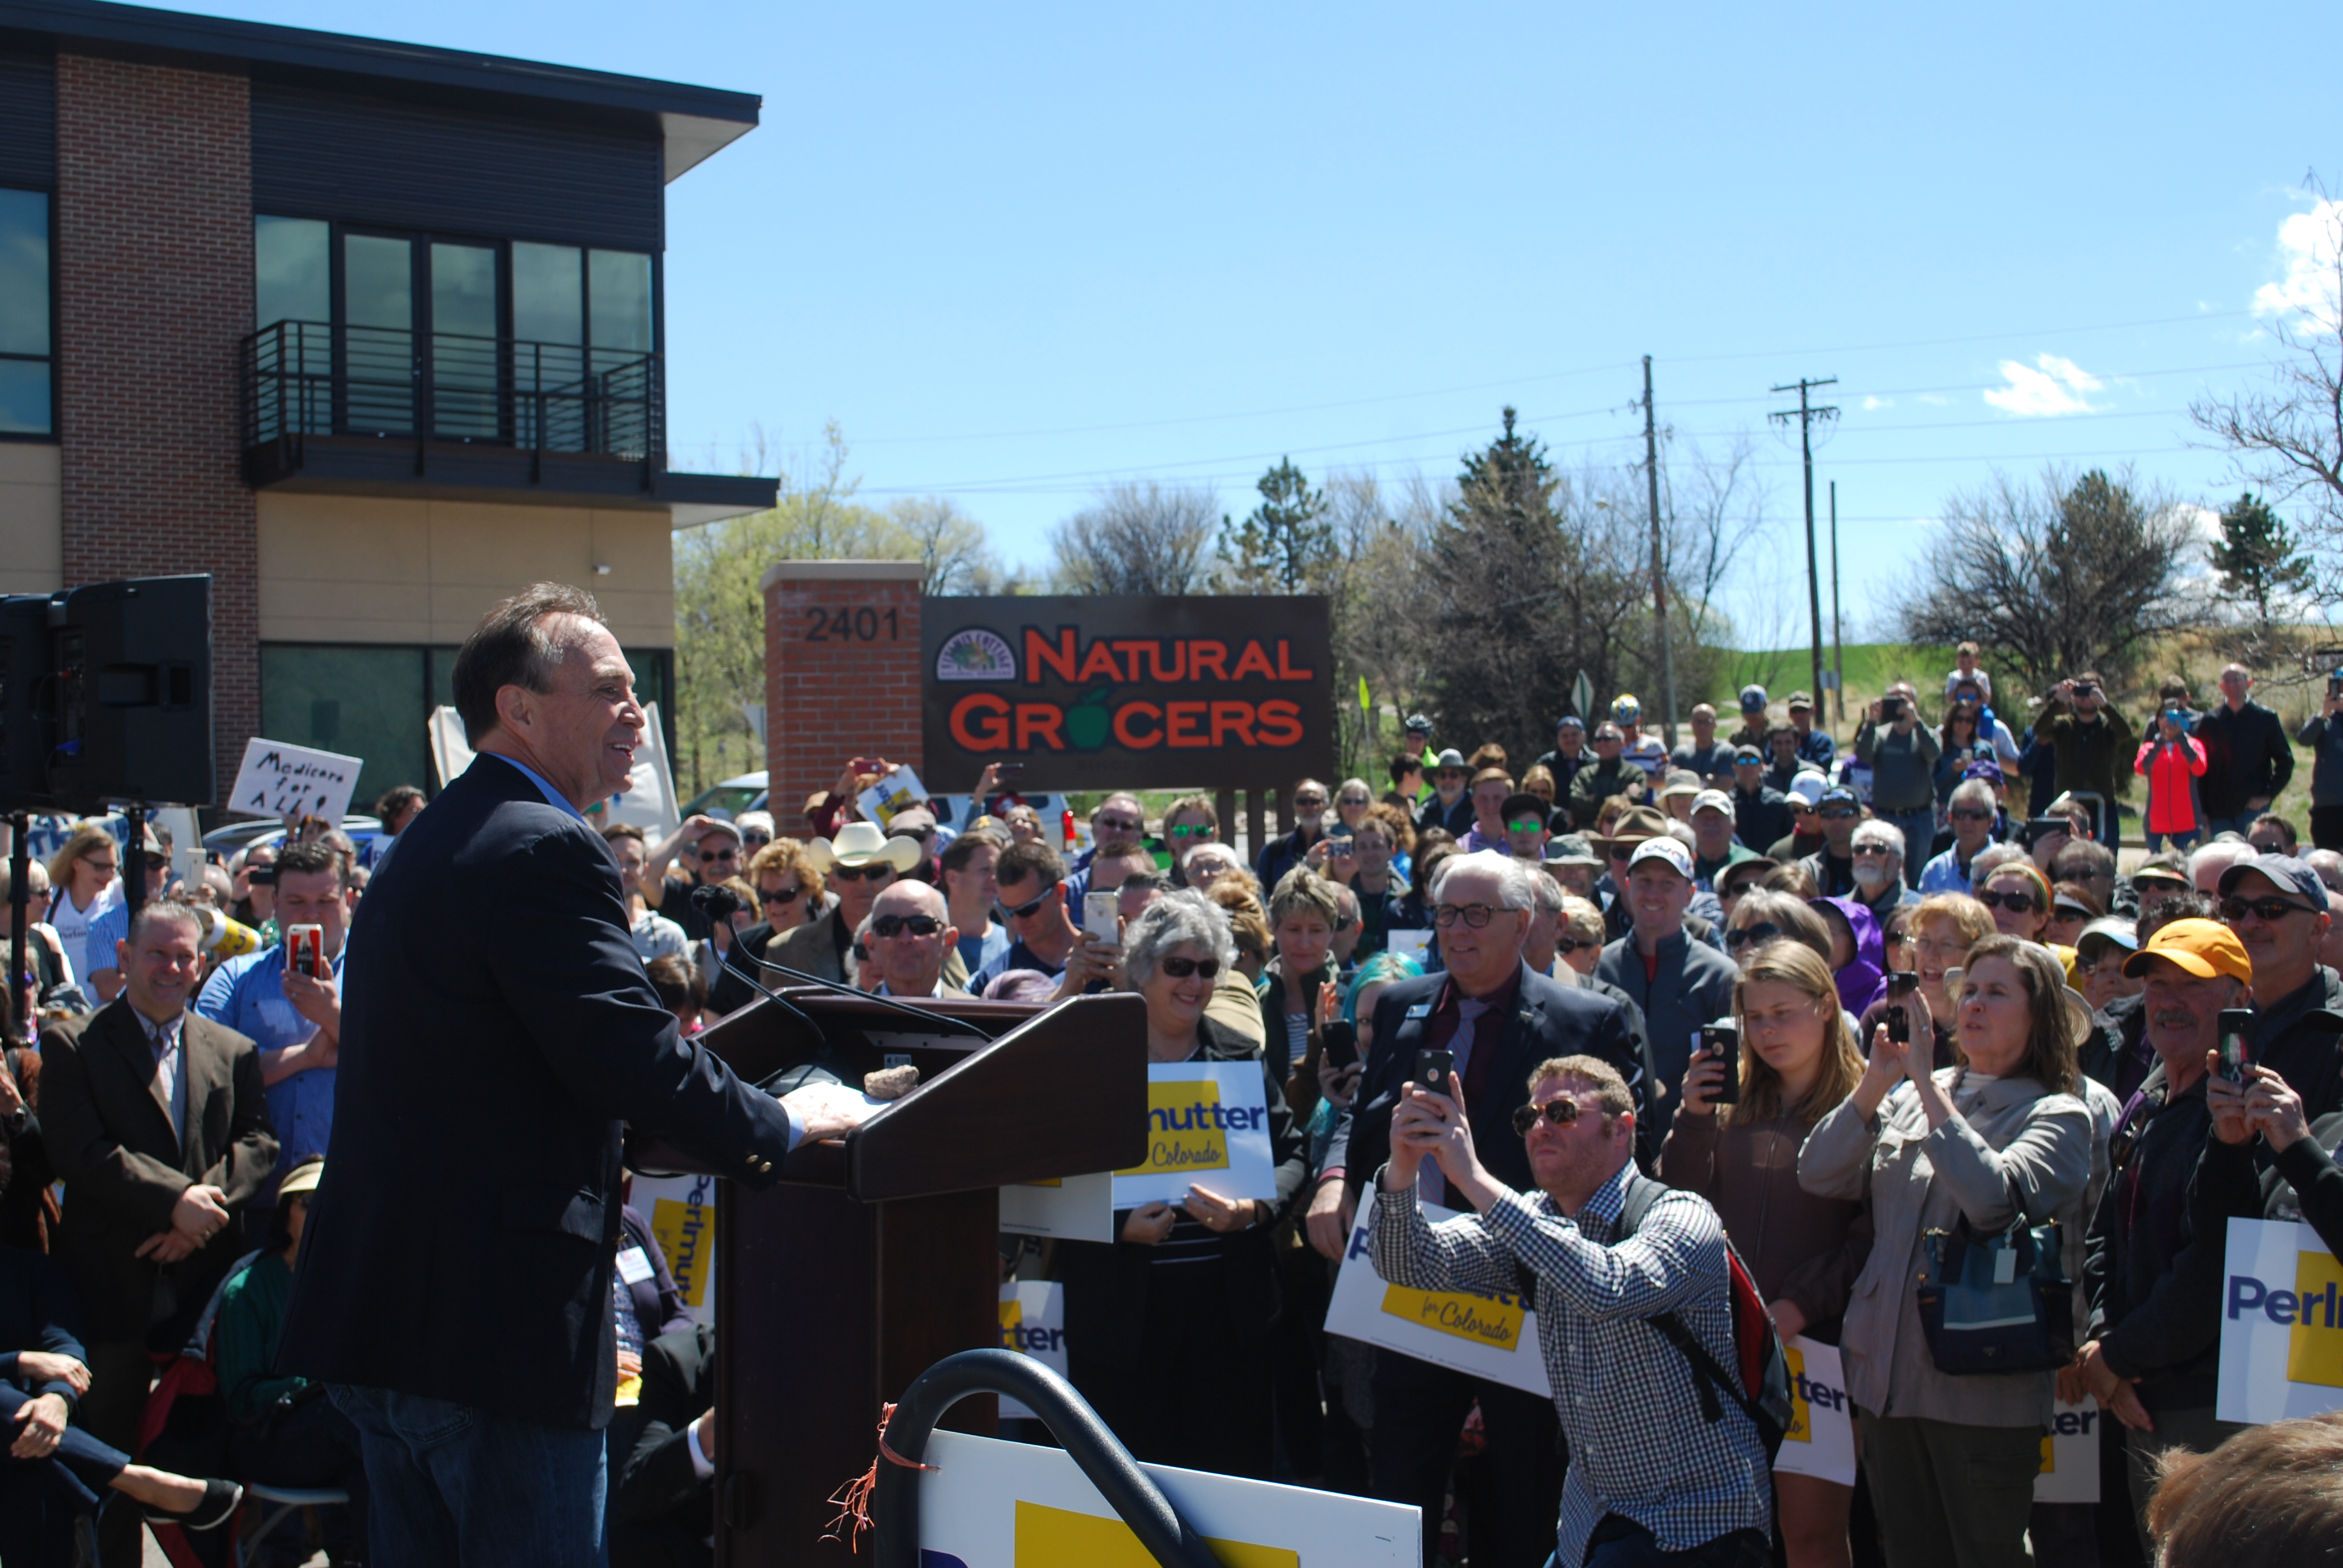 Photo: Rep. Ed Perlmutter announces gubernatorial bid (Staff)